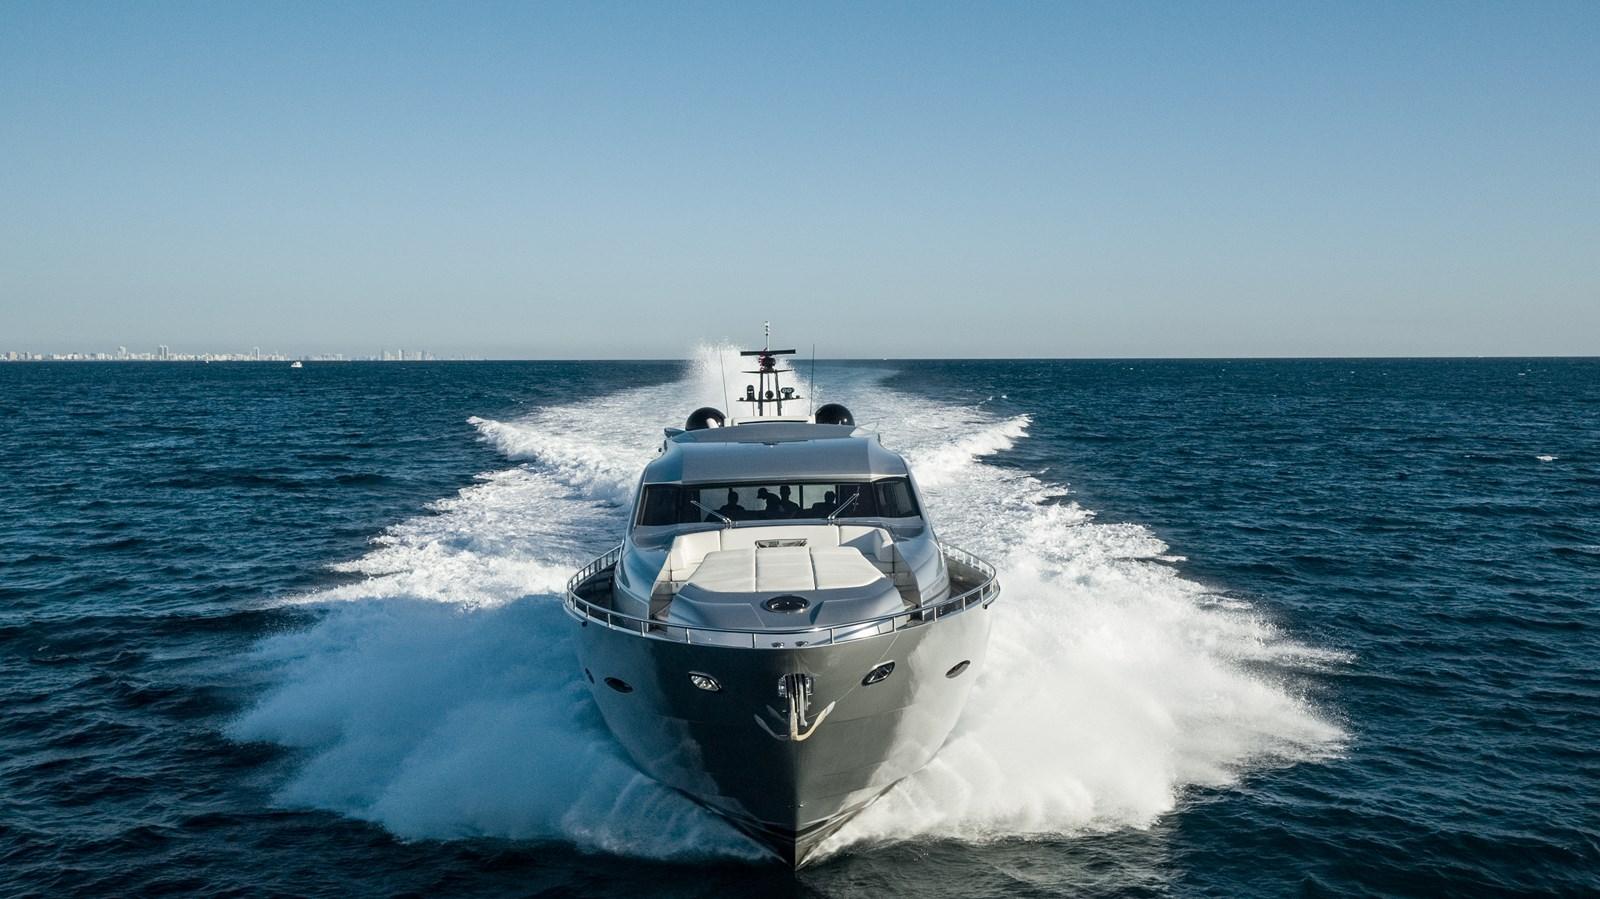 DJI_0011 2012 PERSHING  Motor Yacht 2810220